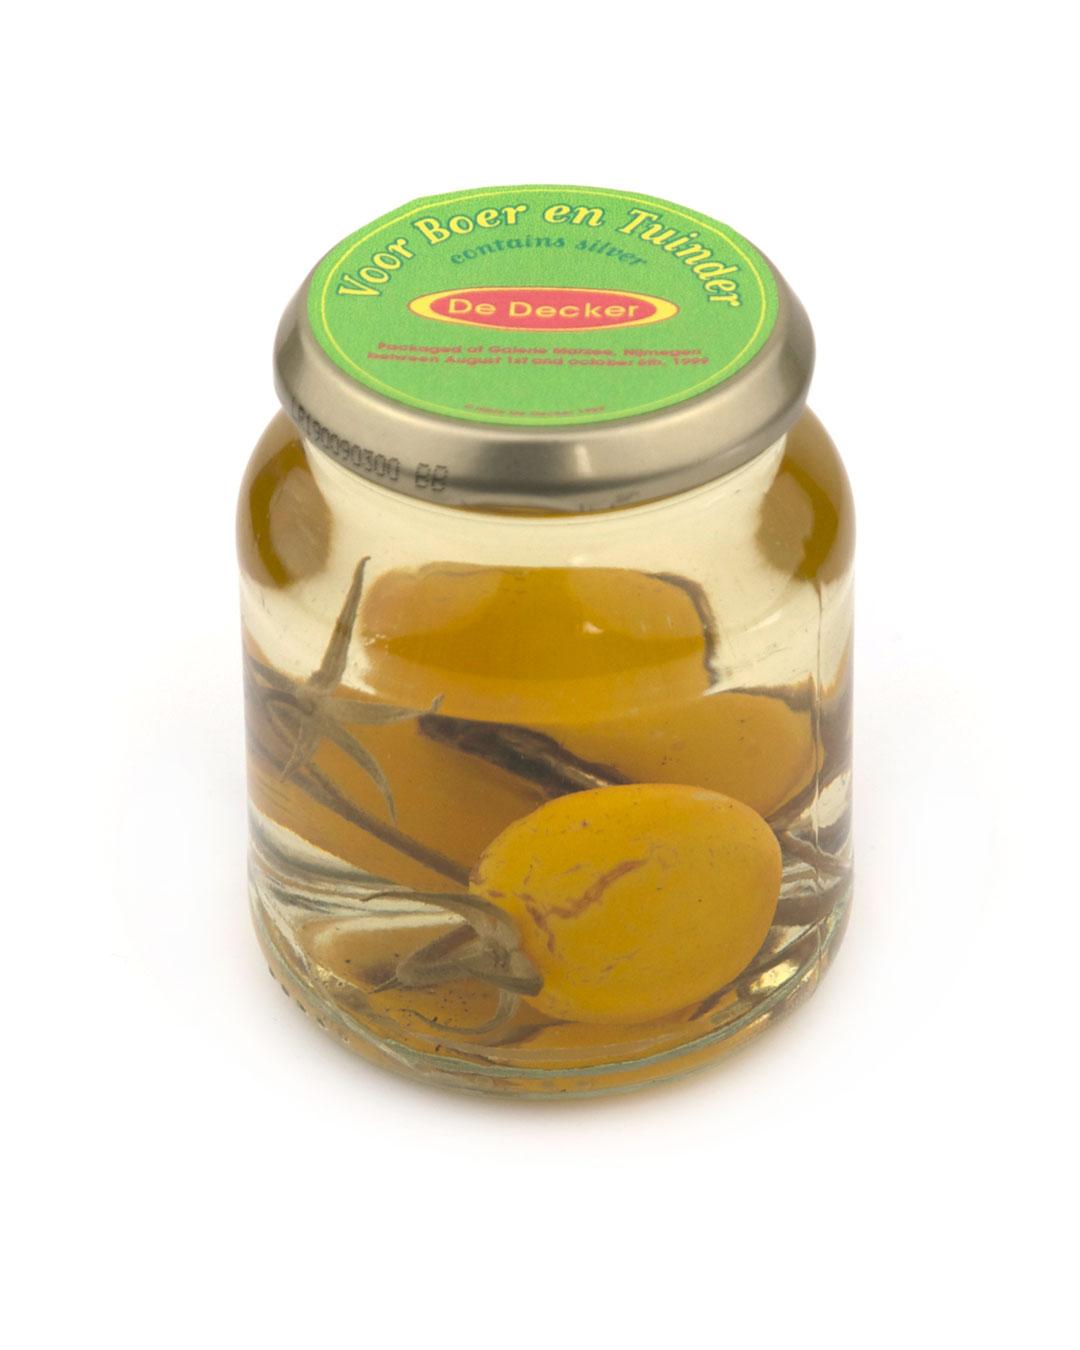 Hilde De Decker, Voor boer en tuinder (For the Farmer and the Market Gardener), packaged at Open Borders, 2004, object; glass, vinegar, vegetable, gold, ø 100 x 130 mm